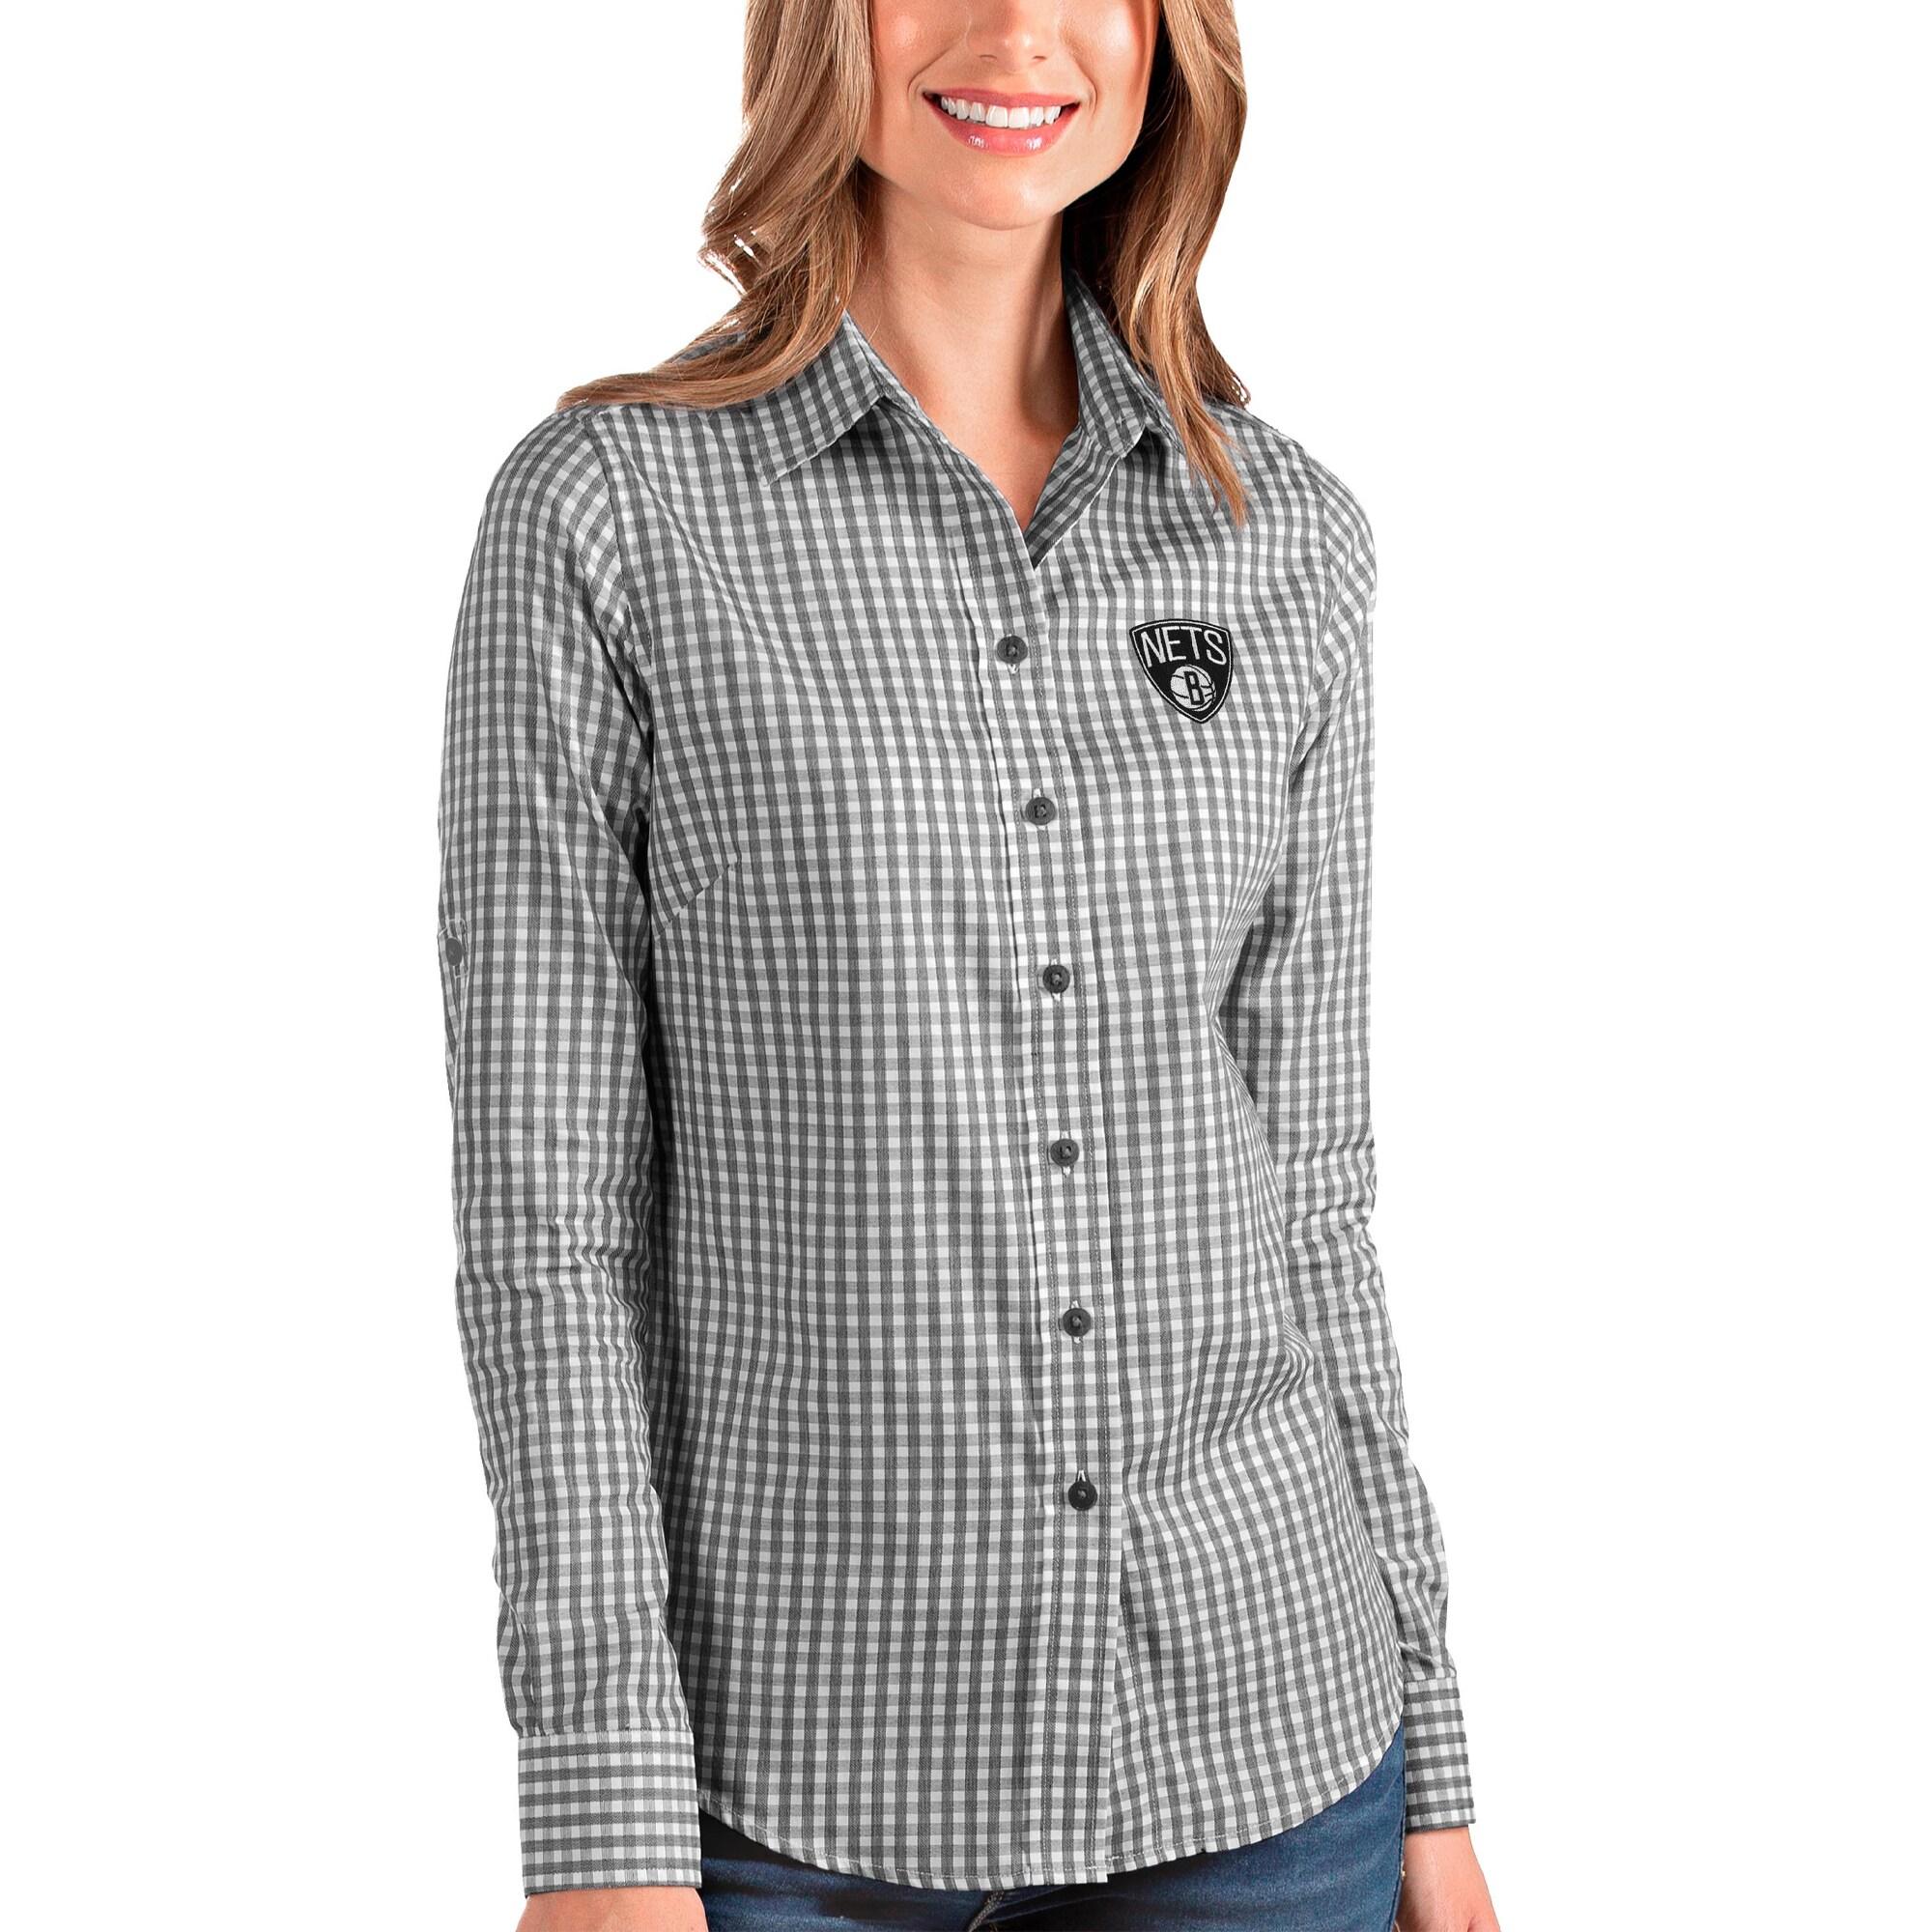 Brooklyn Nets Antigua Women's Structure Button-Up Long Sleeve Shirt - Black/White